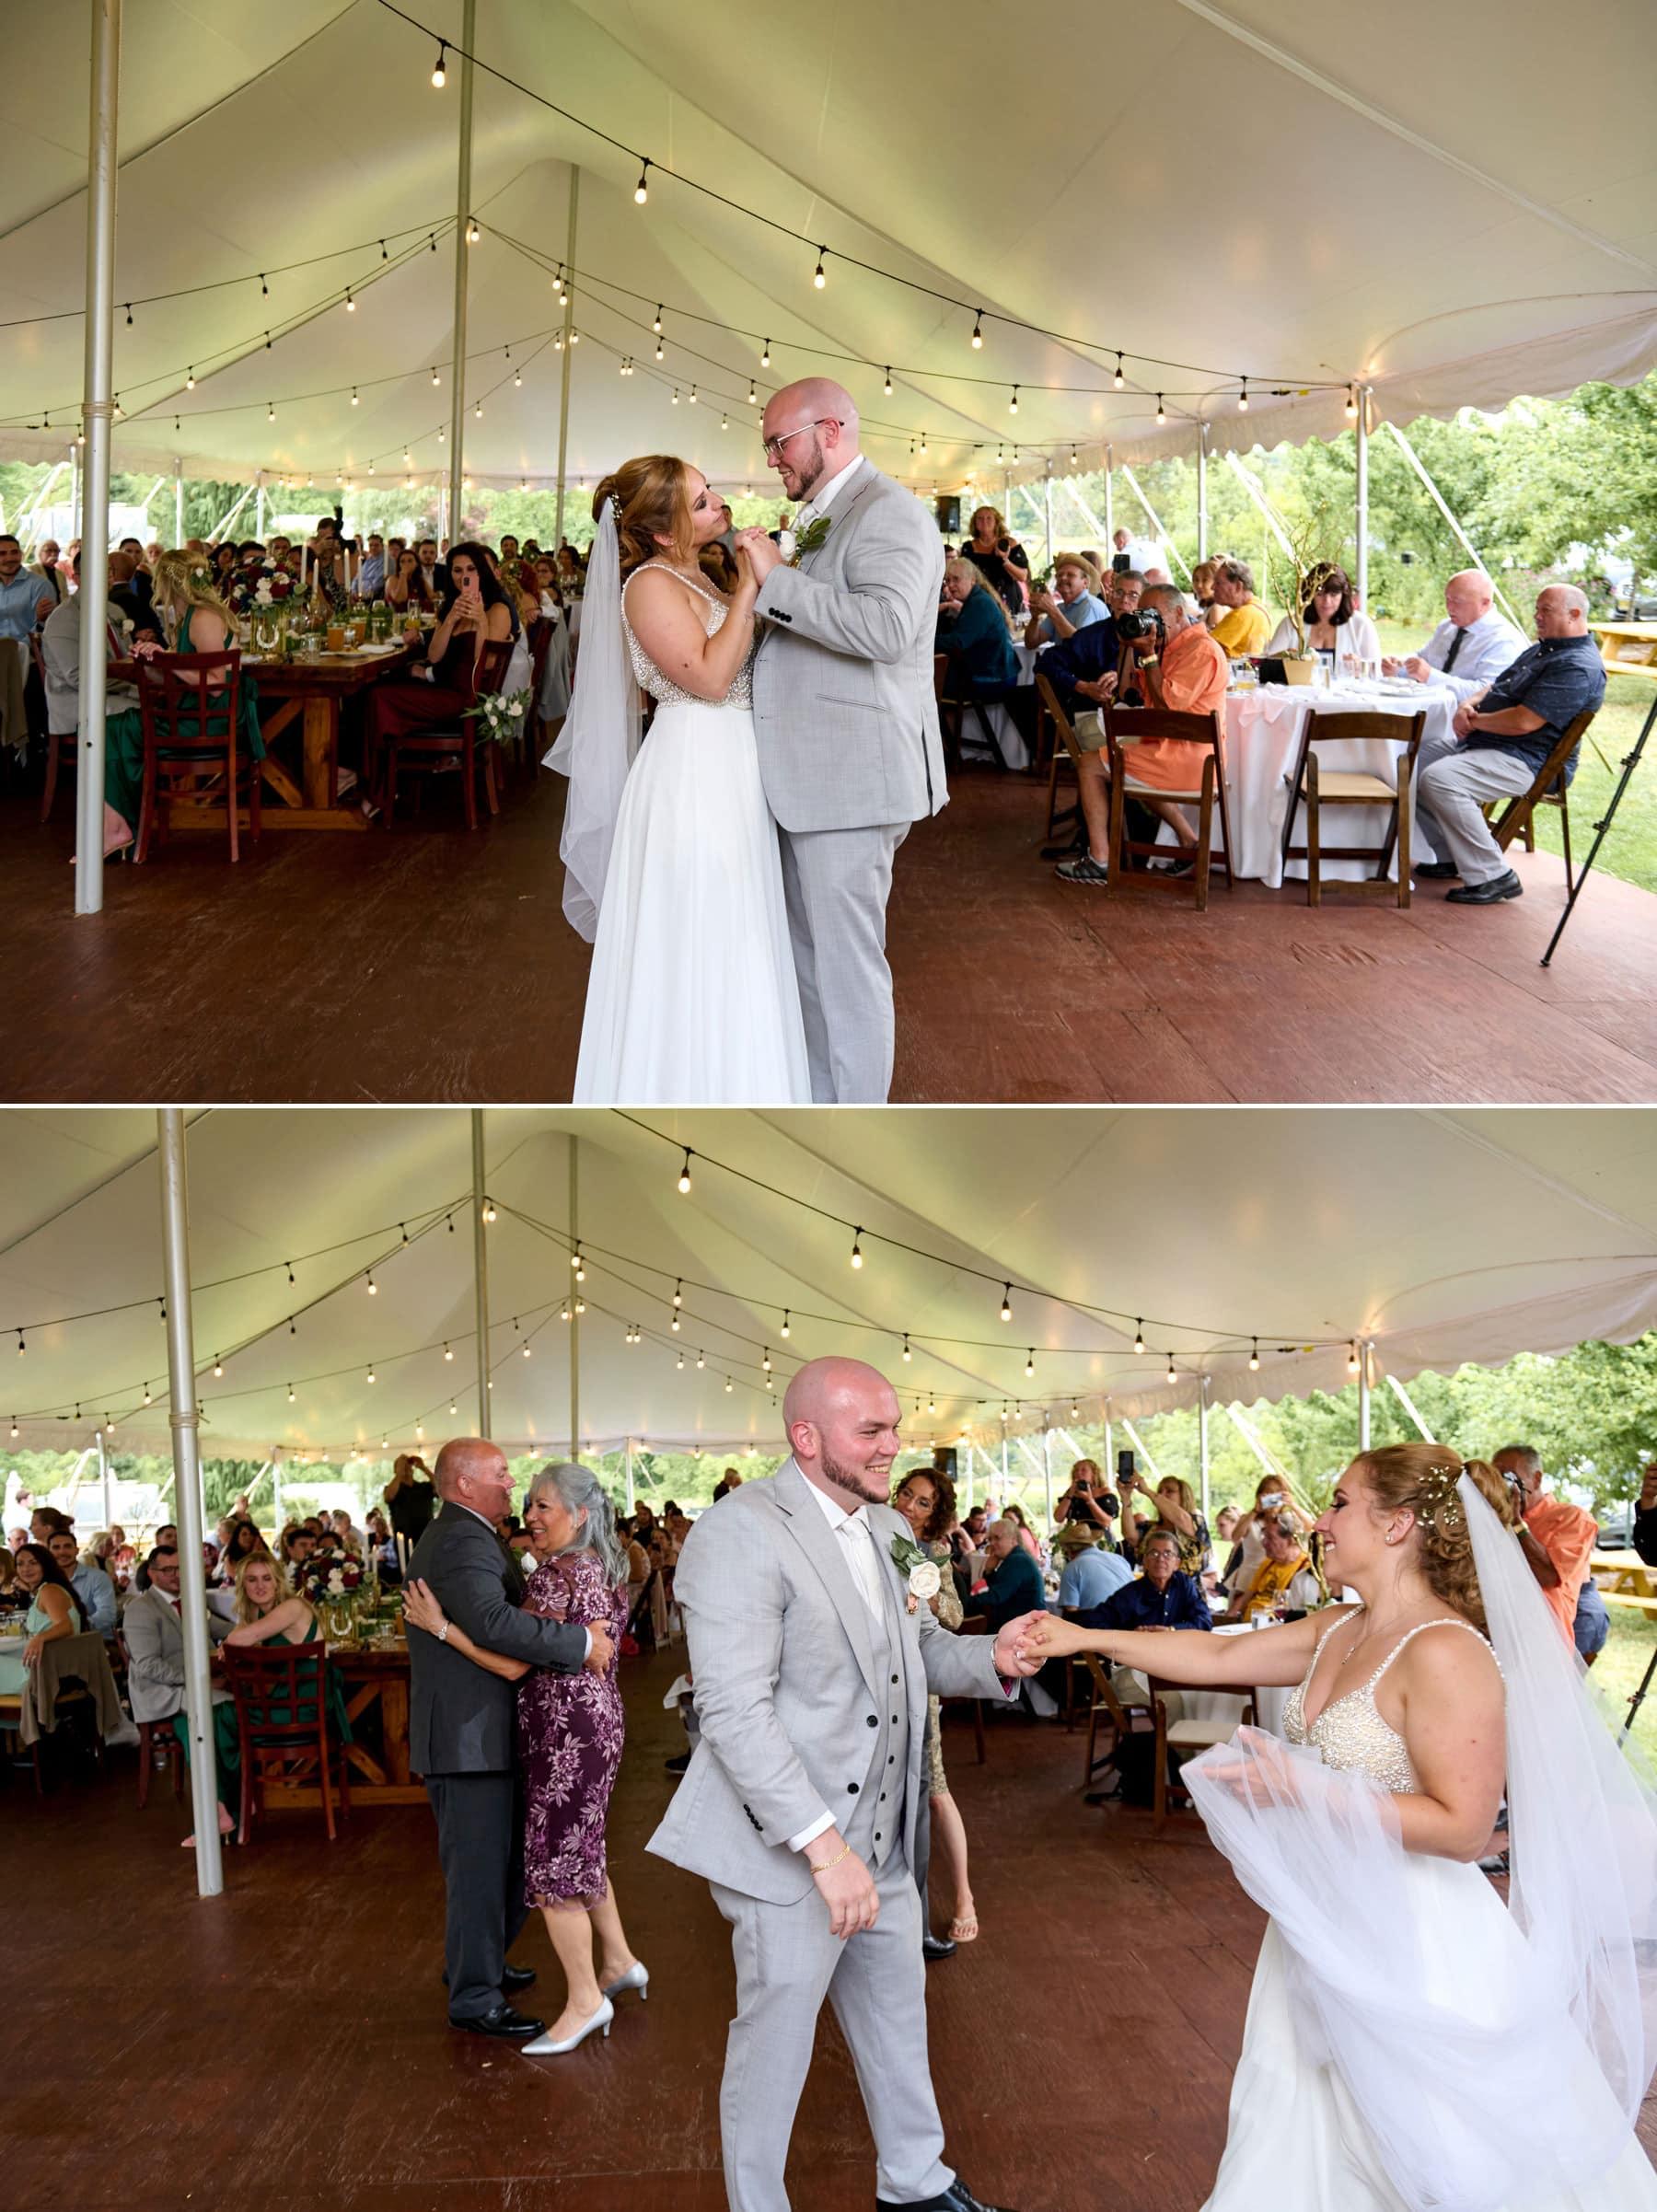 wedding first dance photos at Brick Farm Tavern